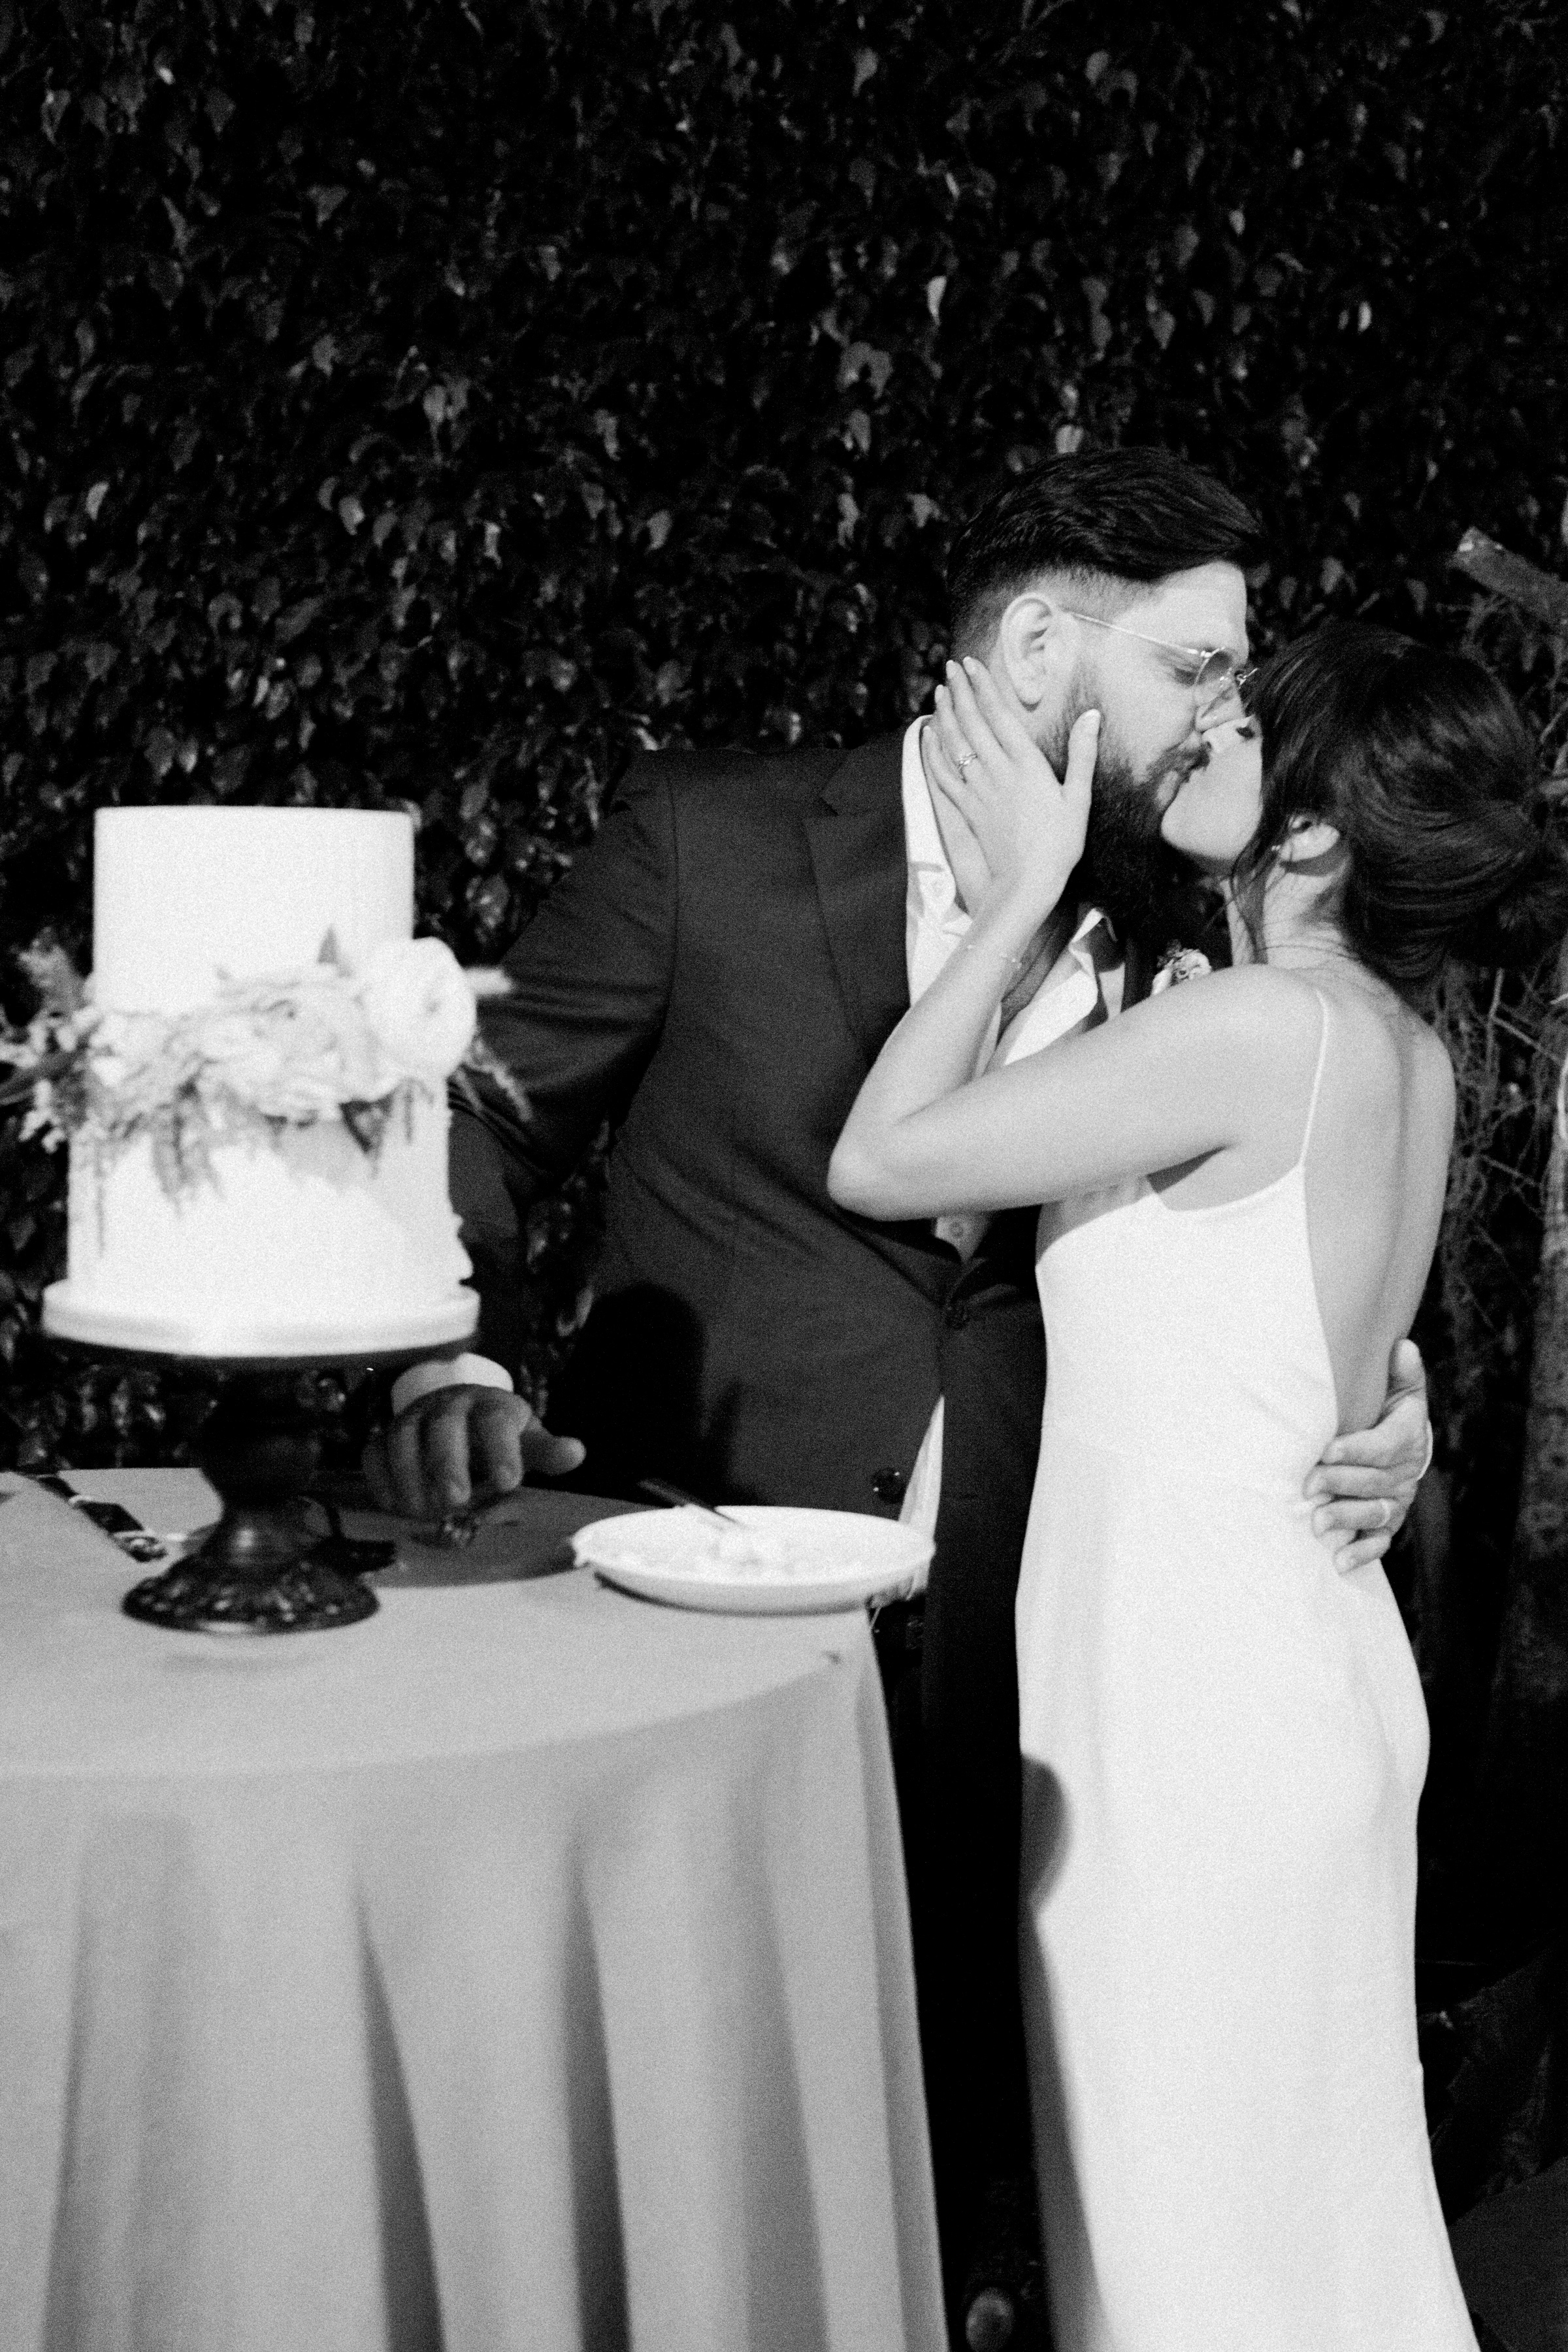 52-bride-goorm-cake-cutting.jpg